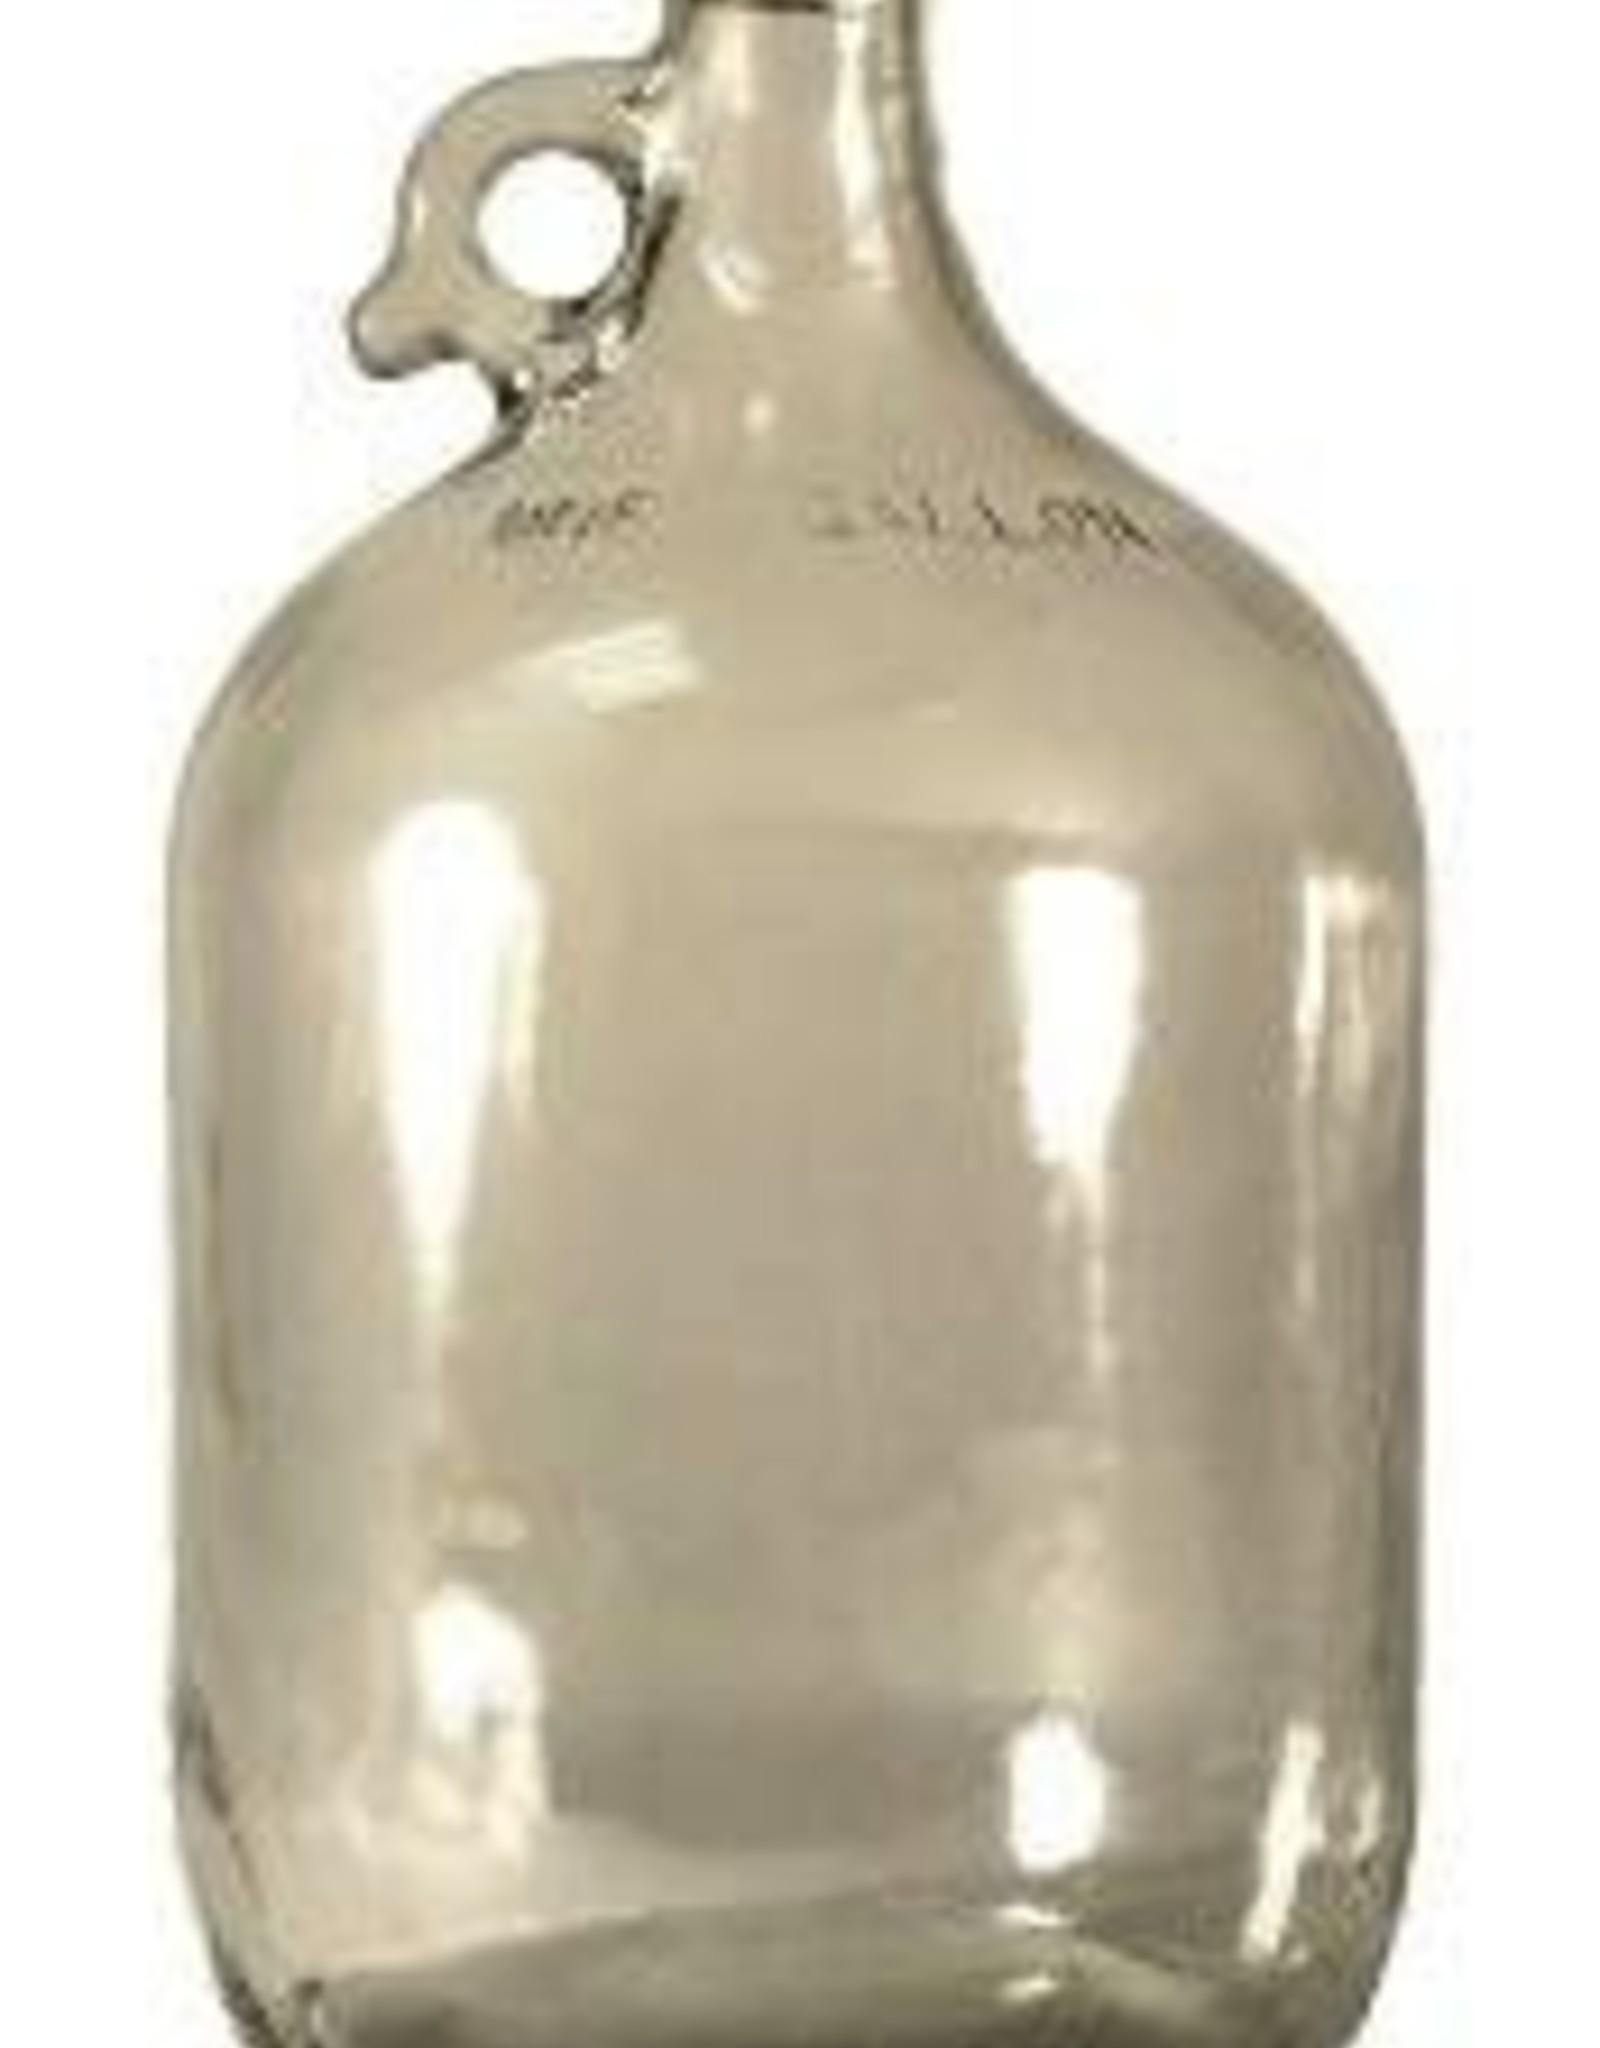 LD CARLSON 1 GALLON GLASS JUG / CARBOY- CASE OF 4